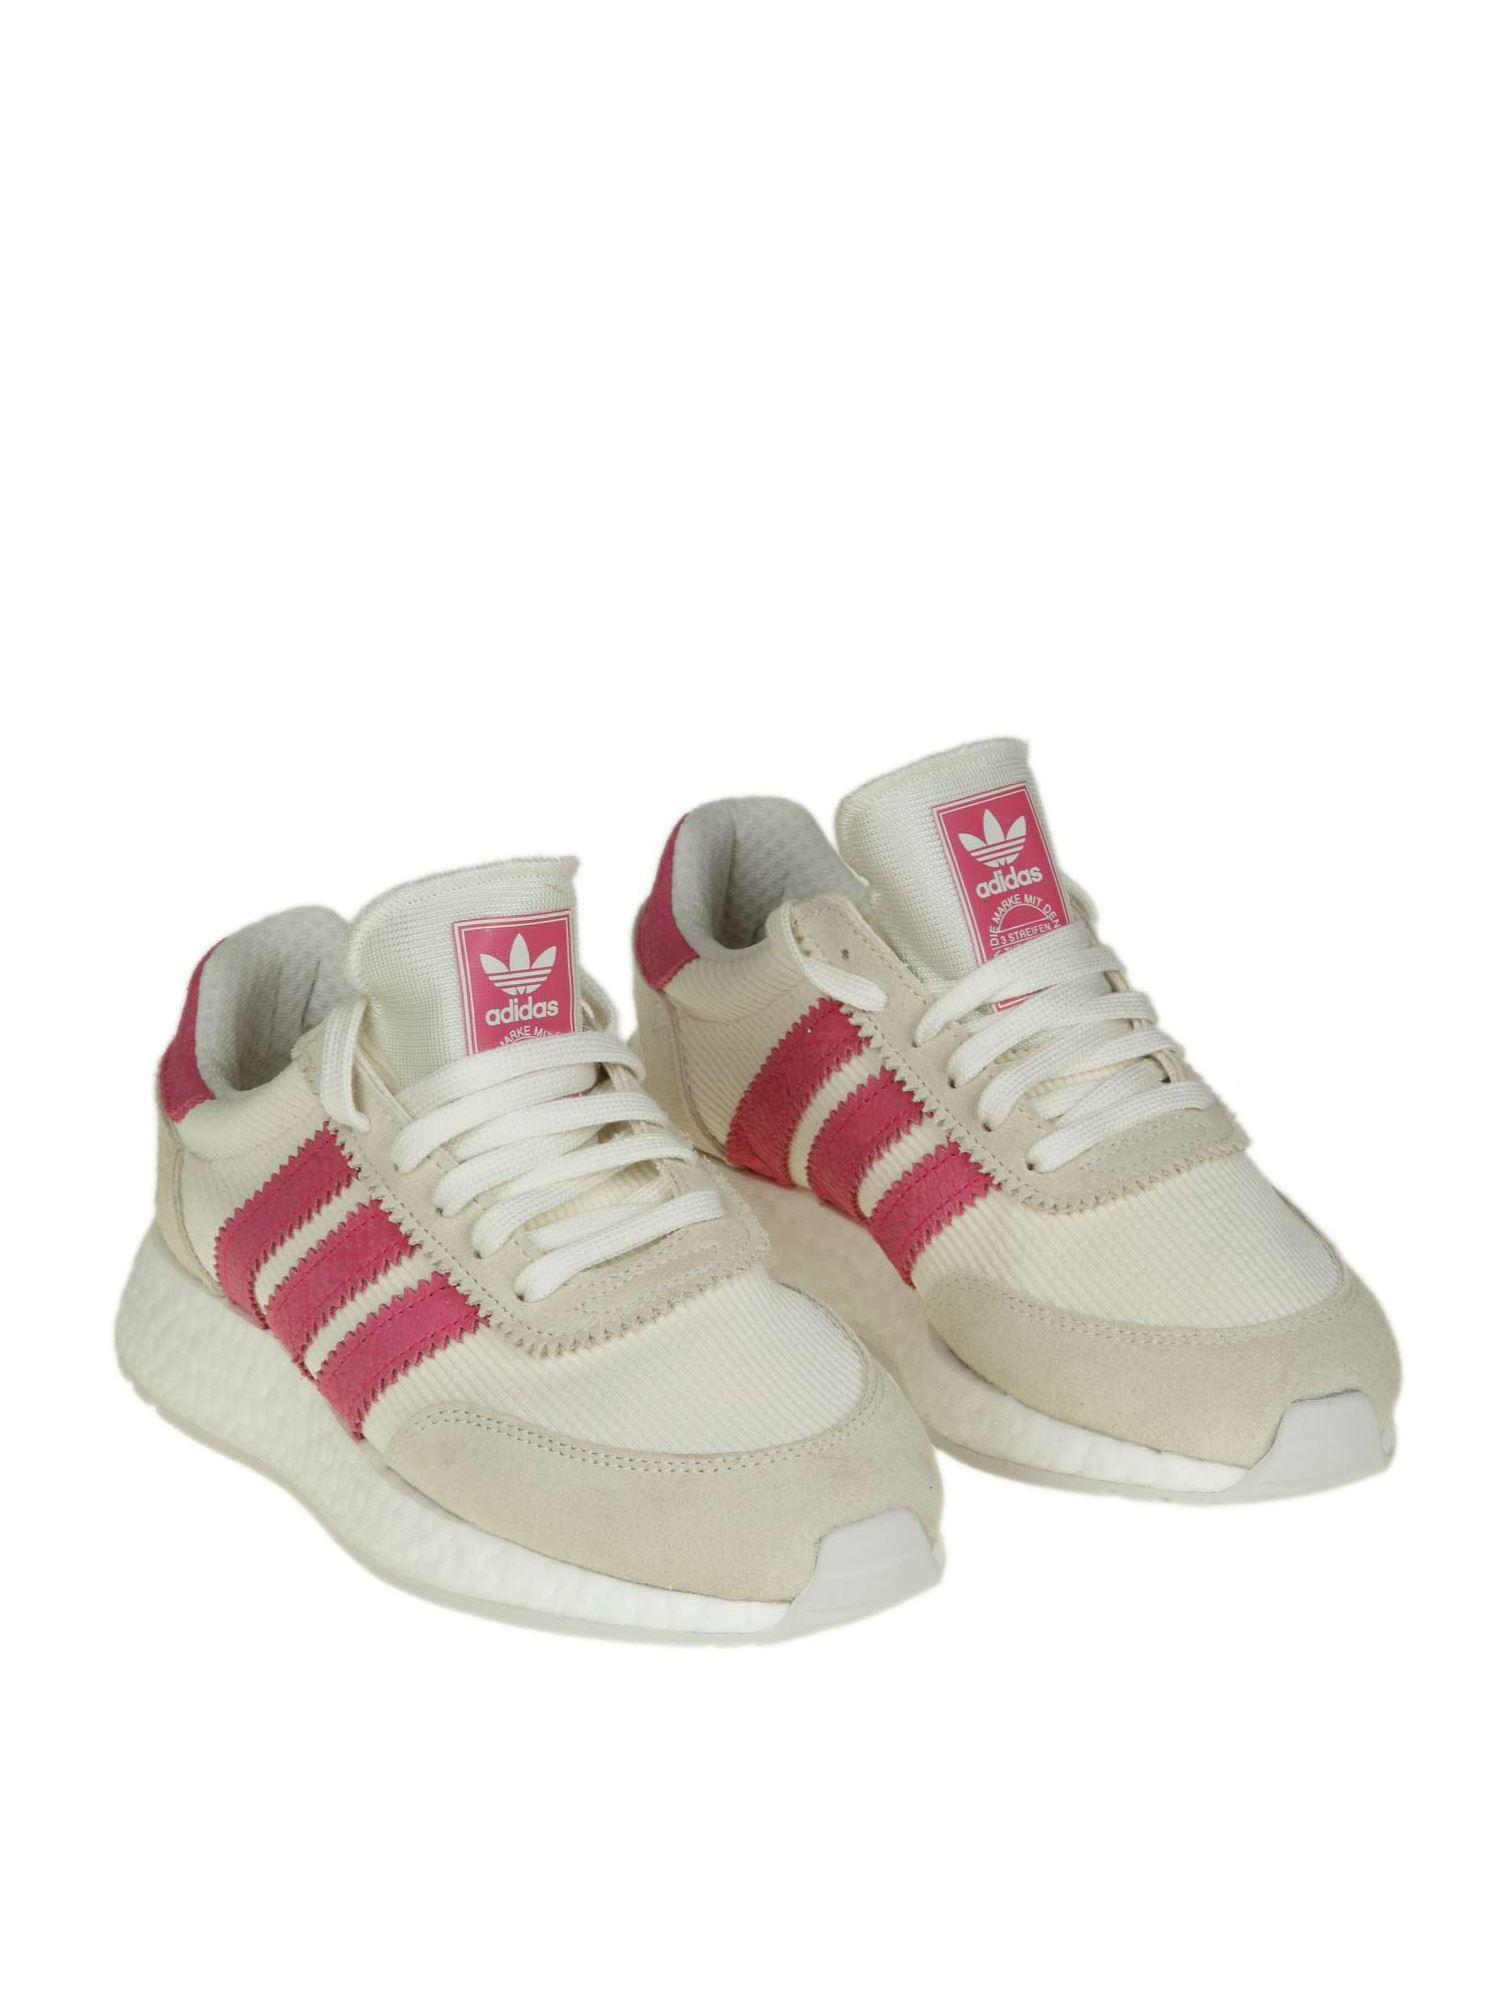 huge discount 9d175 bdd92 Lyst - adidas Originals White And Pink